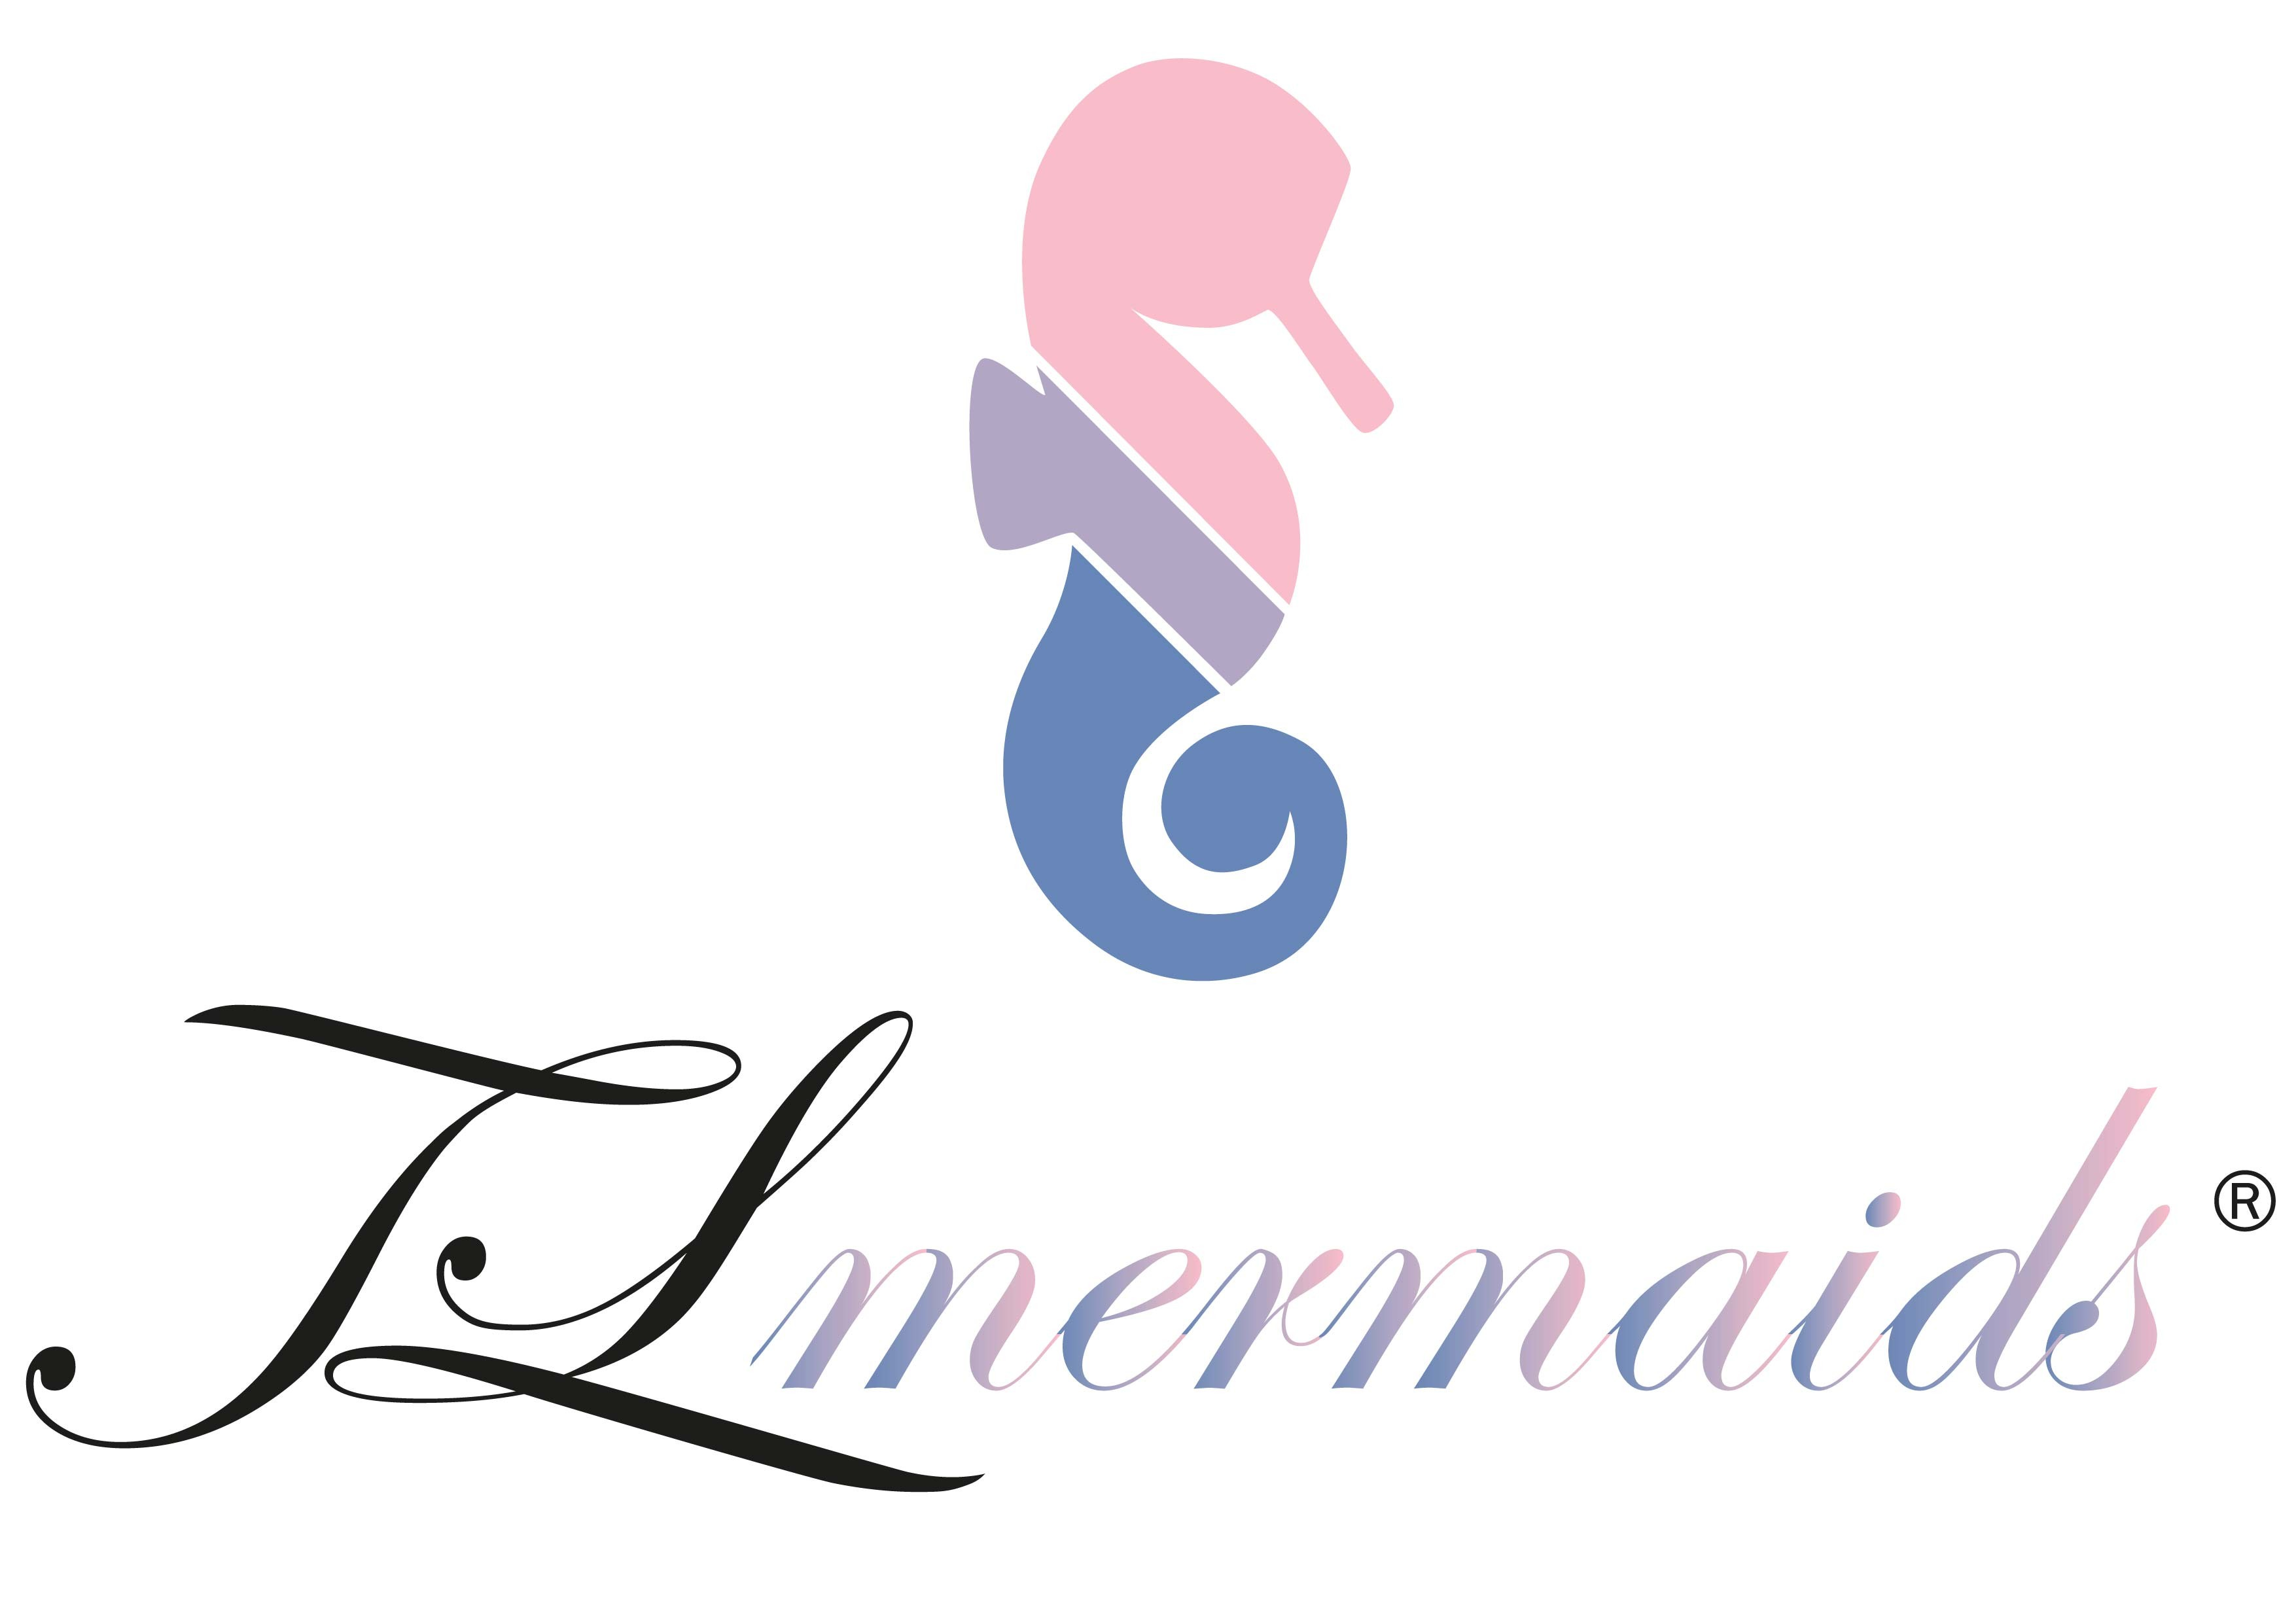 TLmermaids